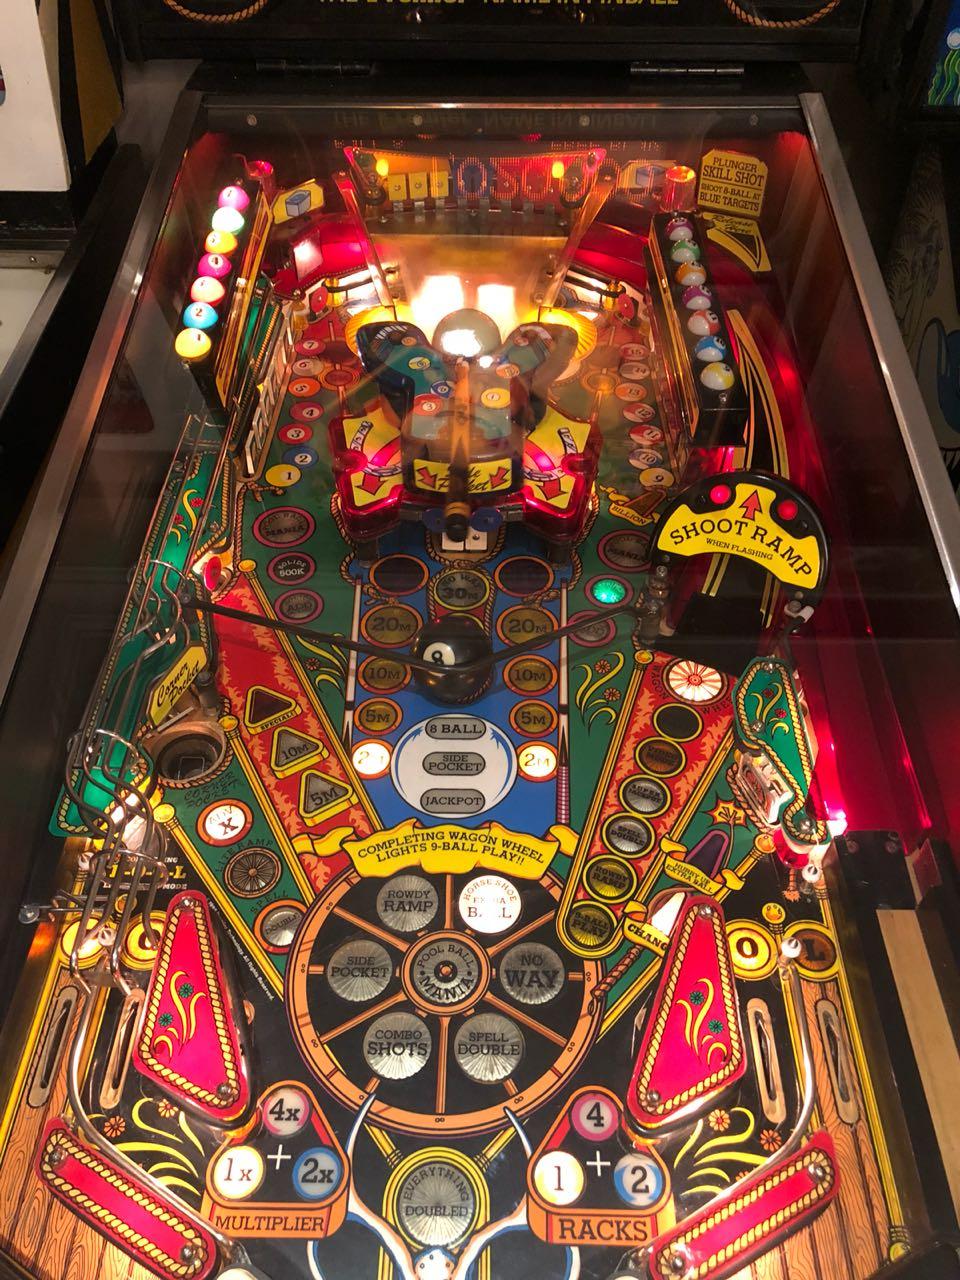 Pinball Machine Cue Ball Wizard by Gottlieb | Junk Mail